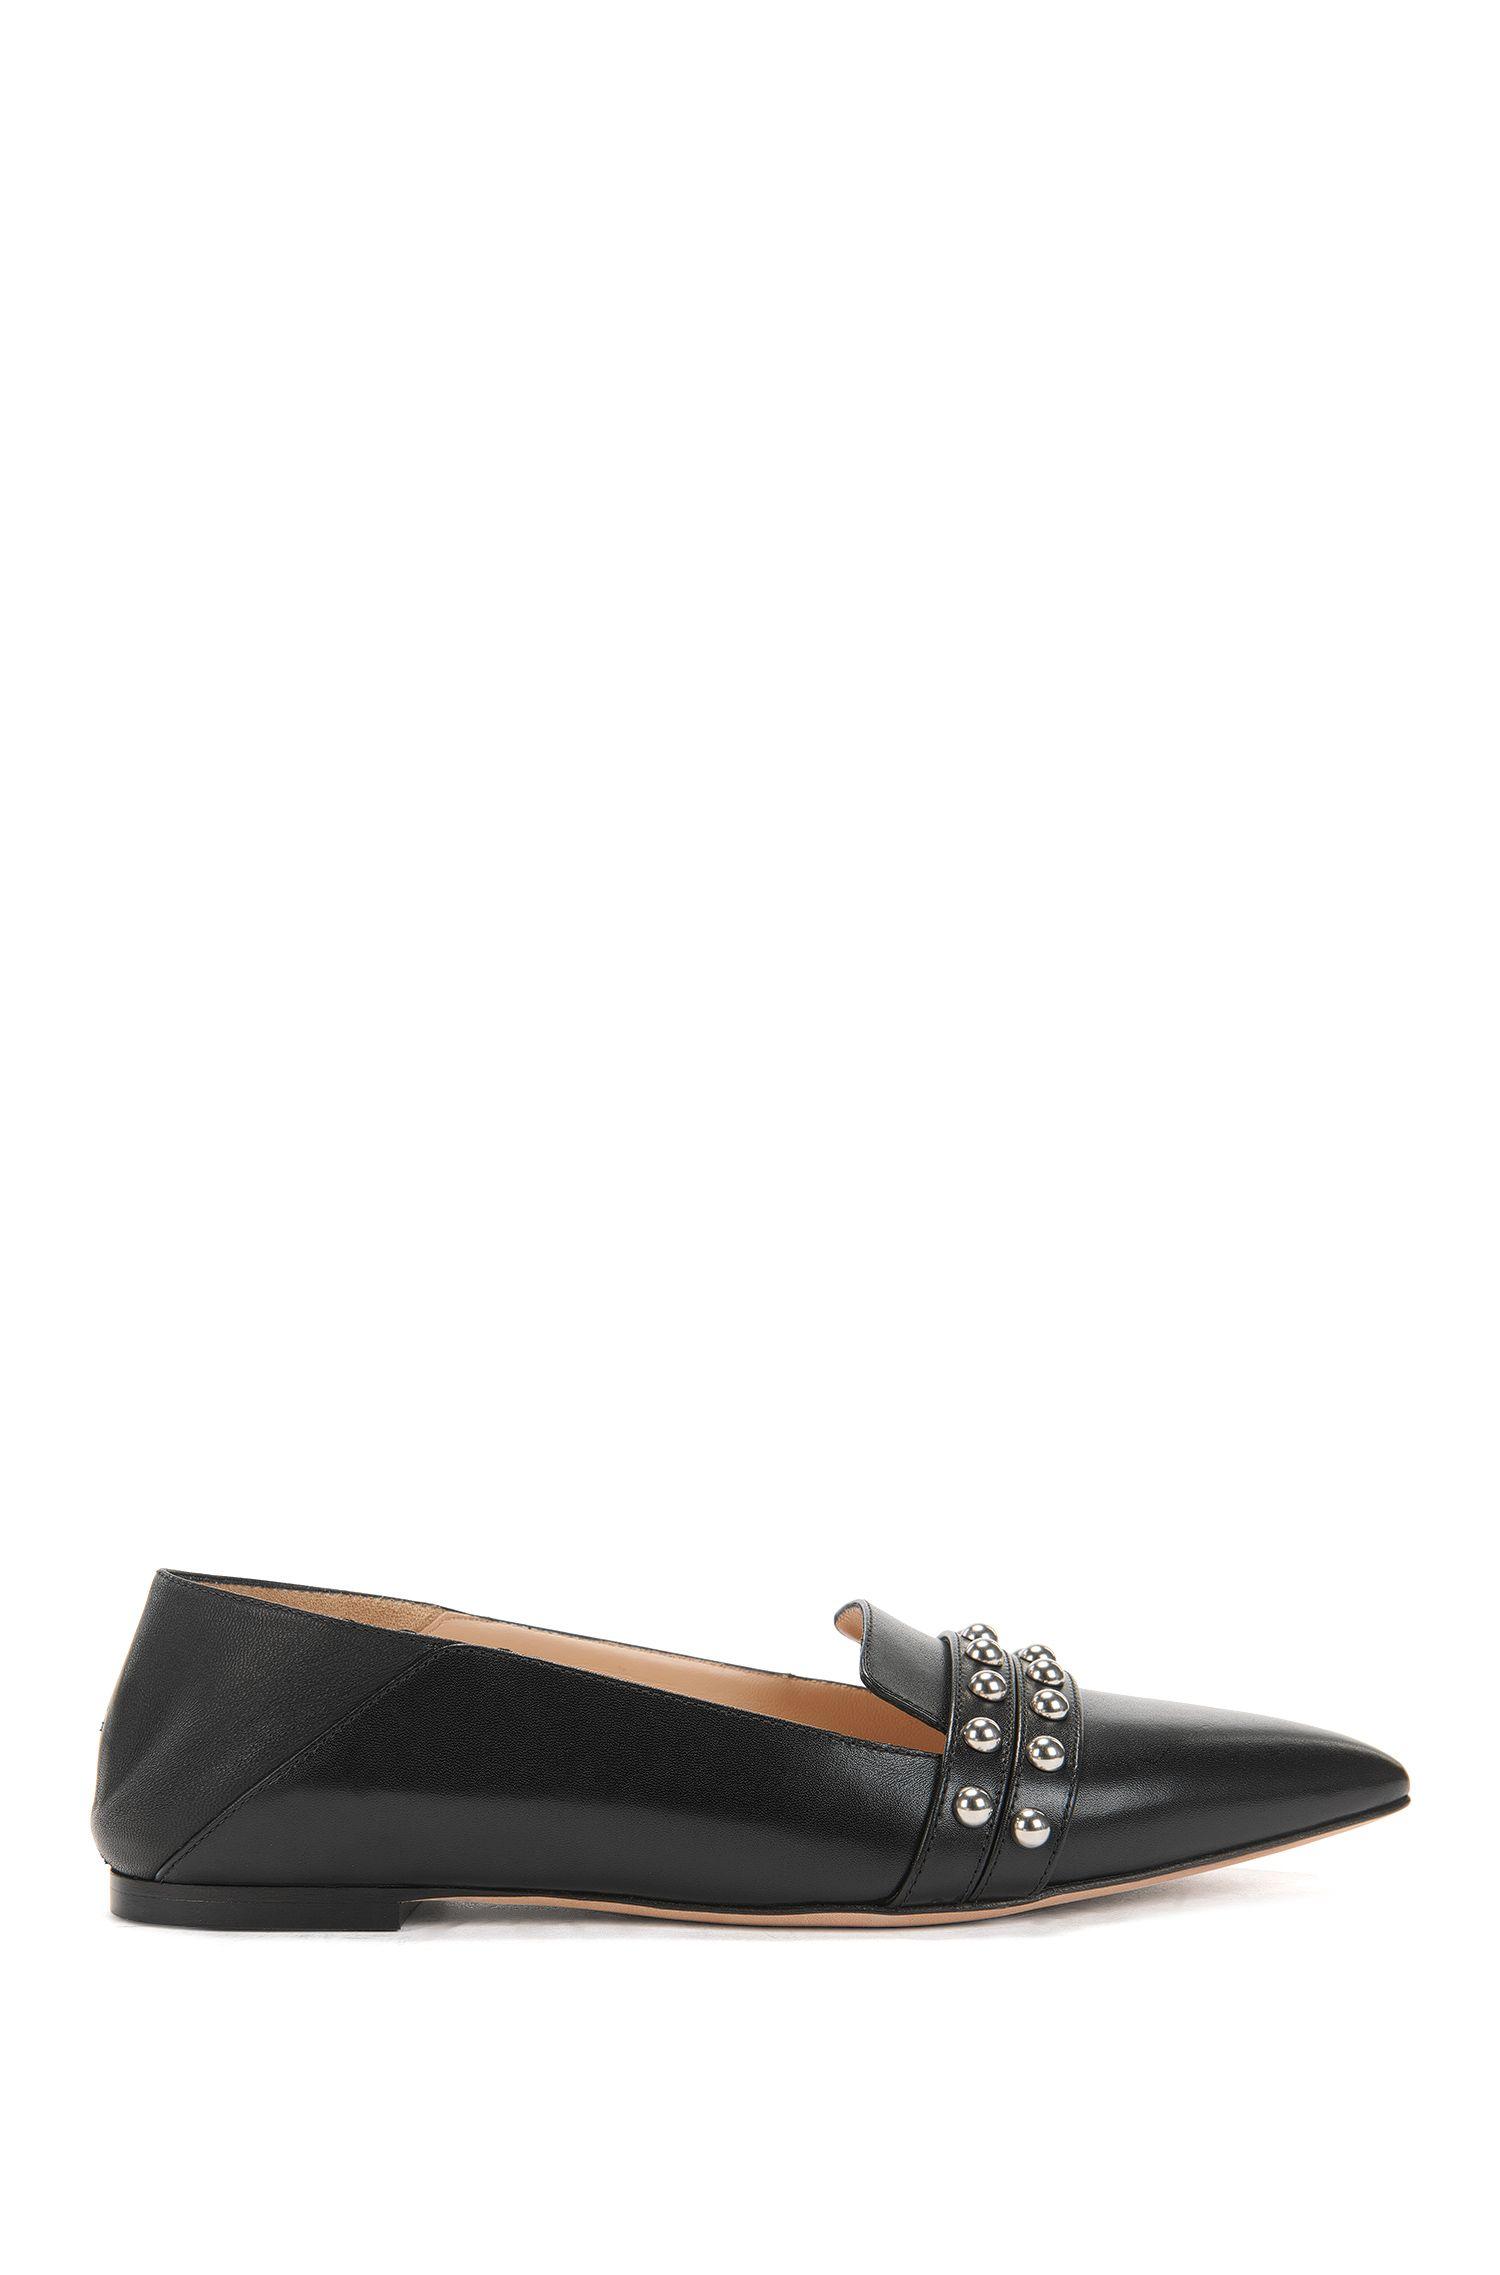 Studded Leather Ballerina Flat | Shortditch Ballerina